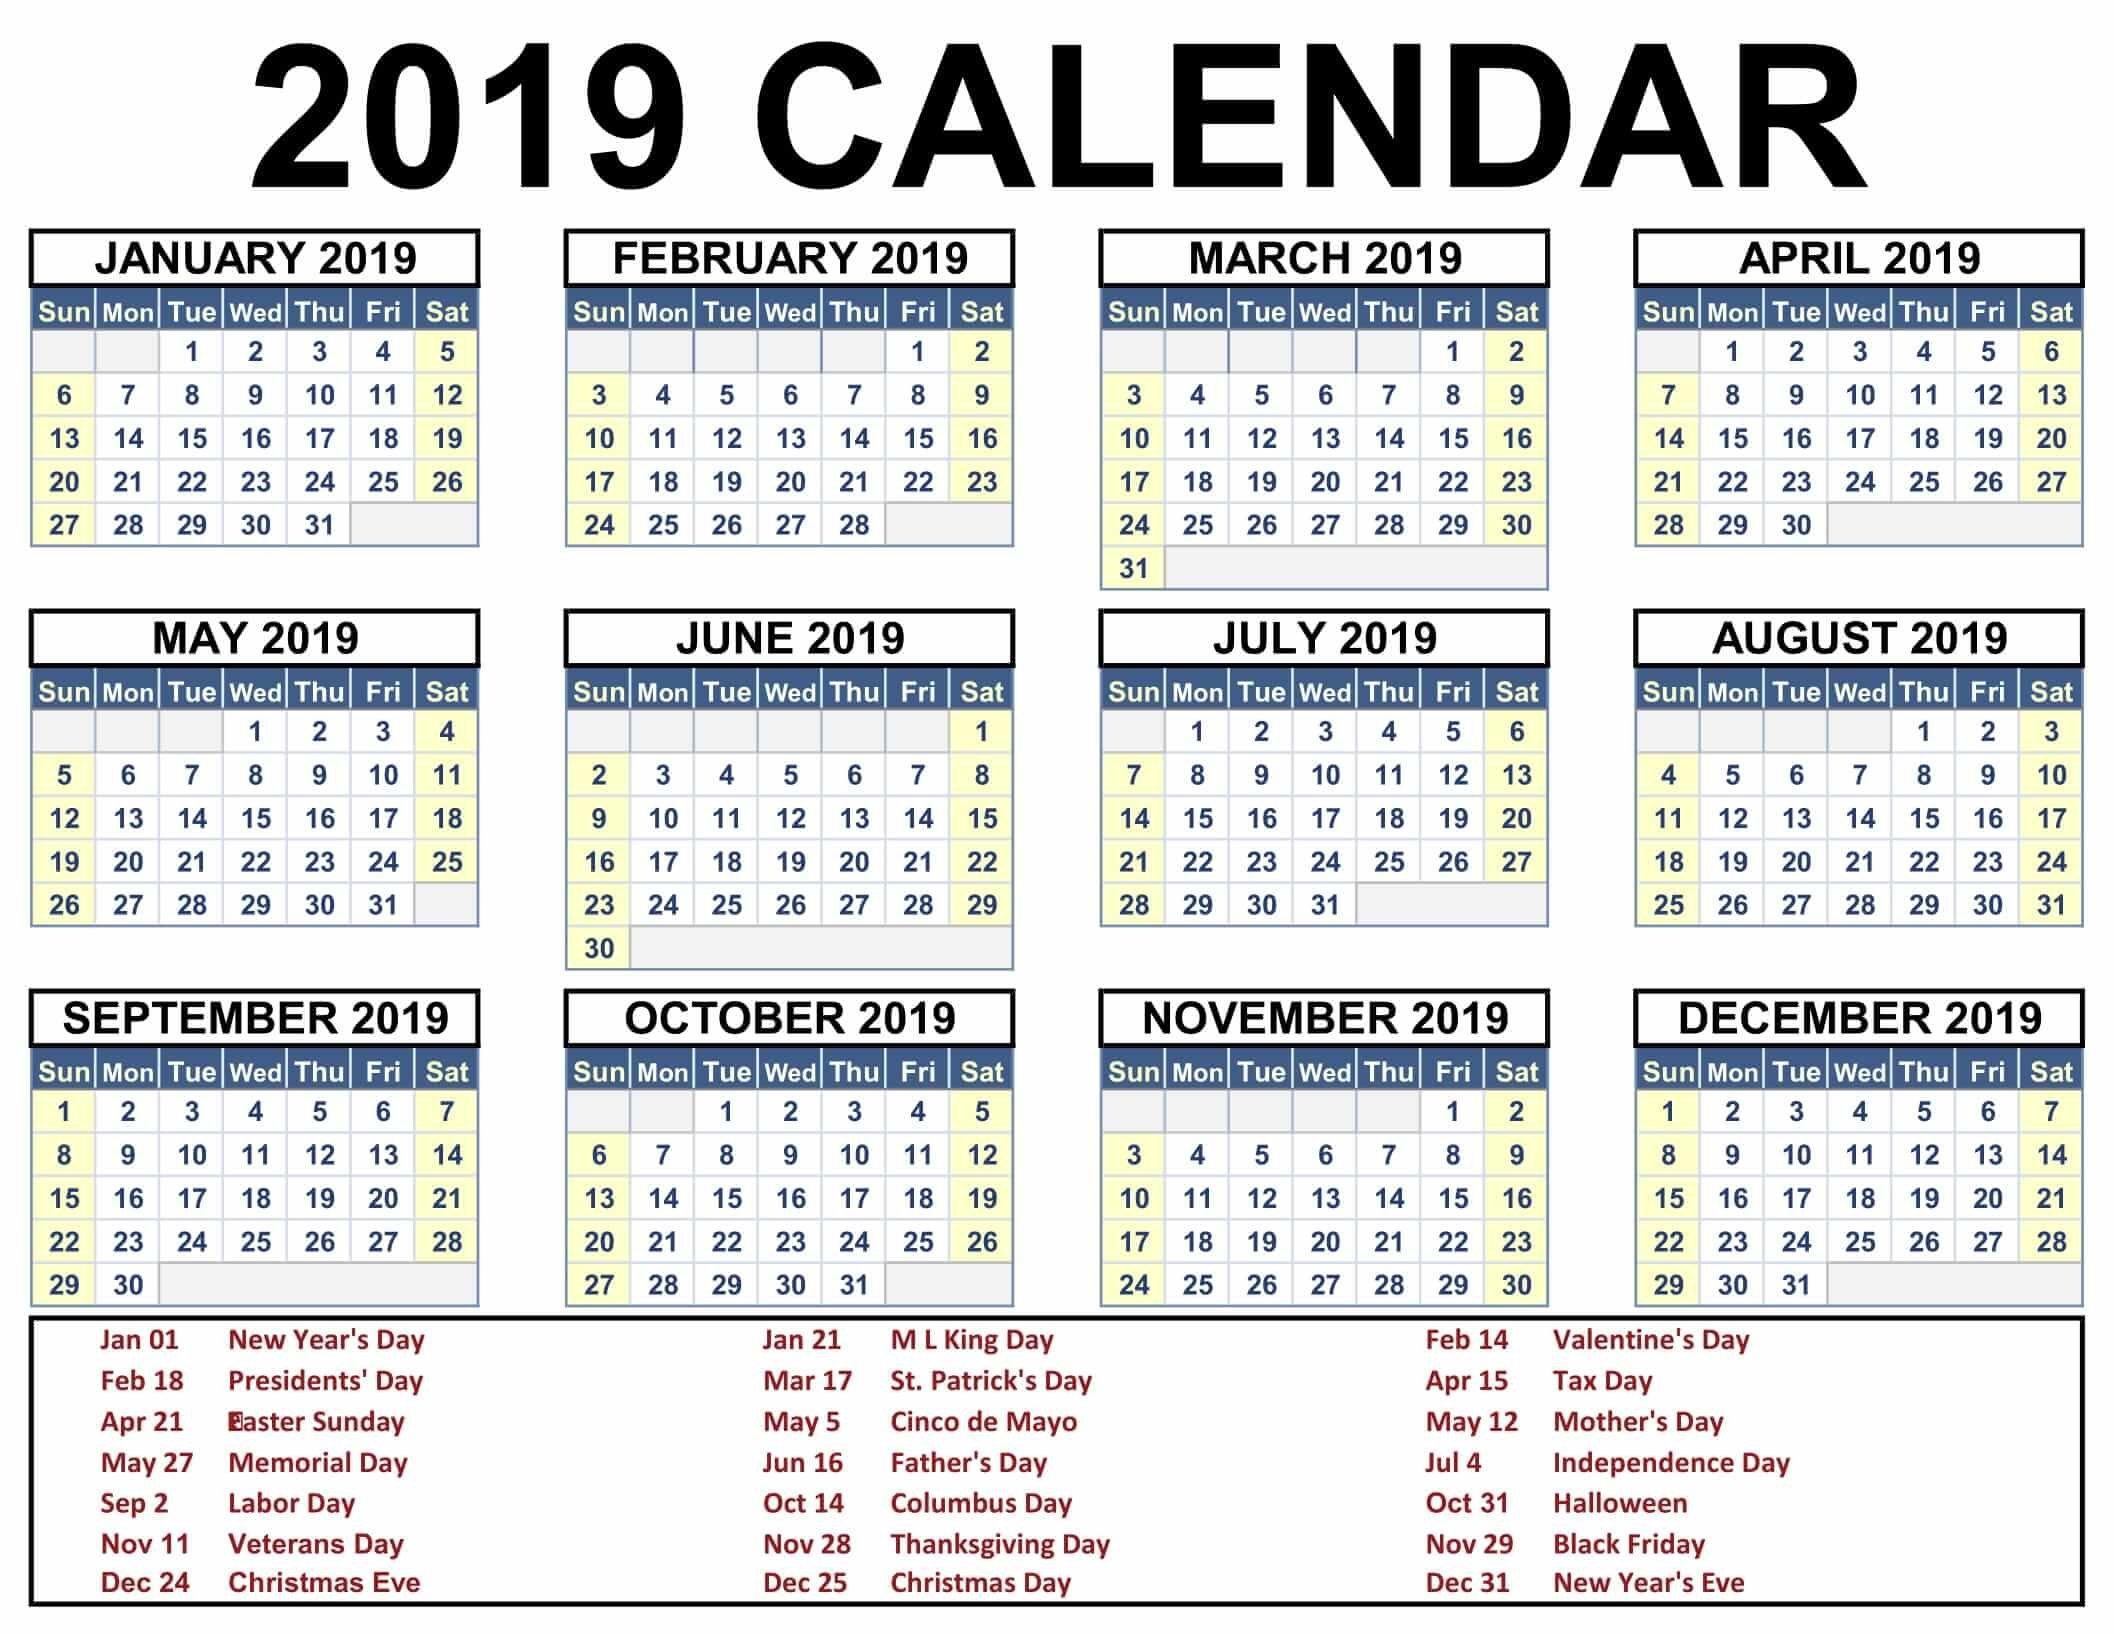 Printable Blank 2019 Calendar Templates – Calenndar Picture Of A 2019 Calendar